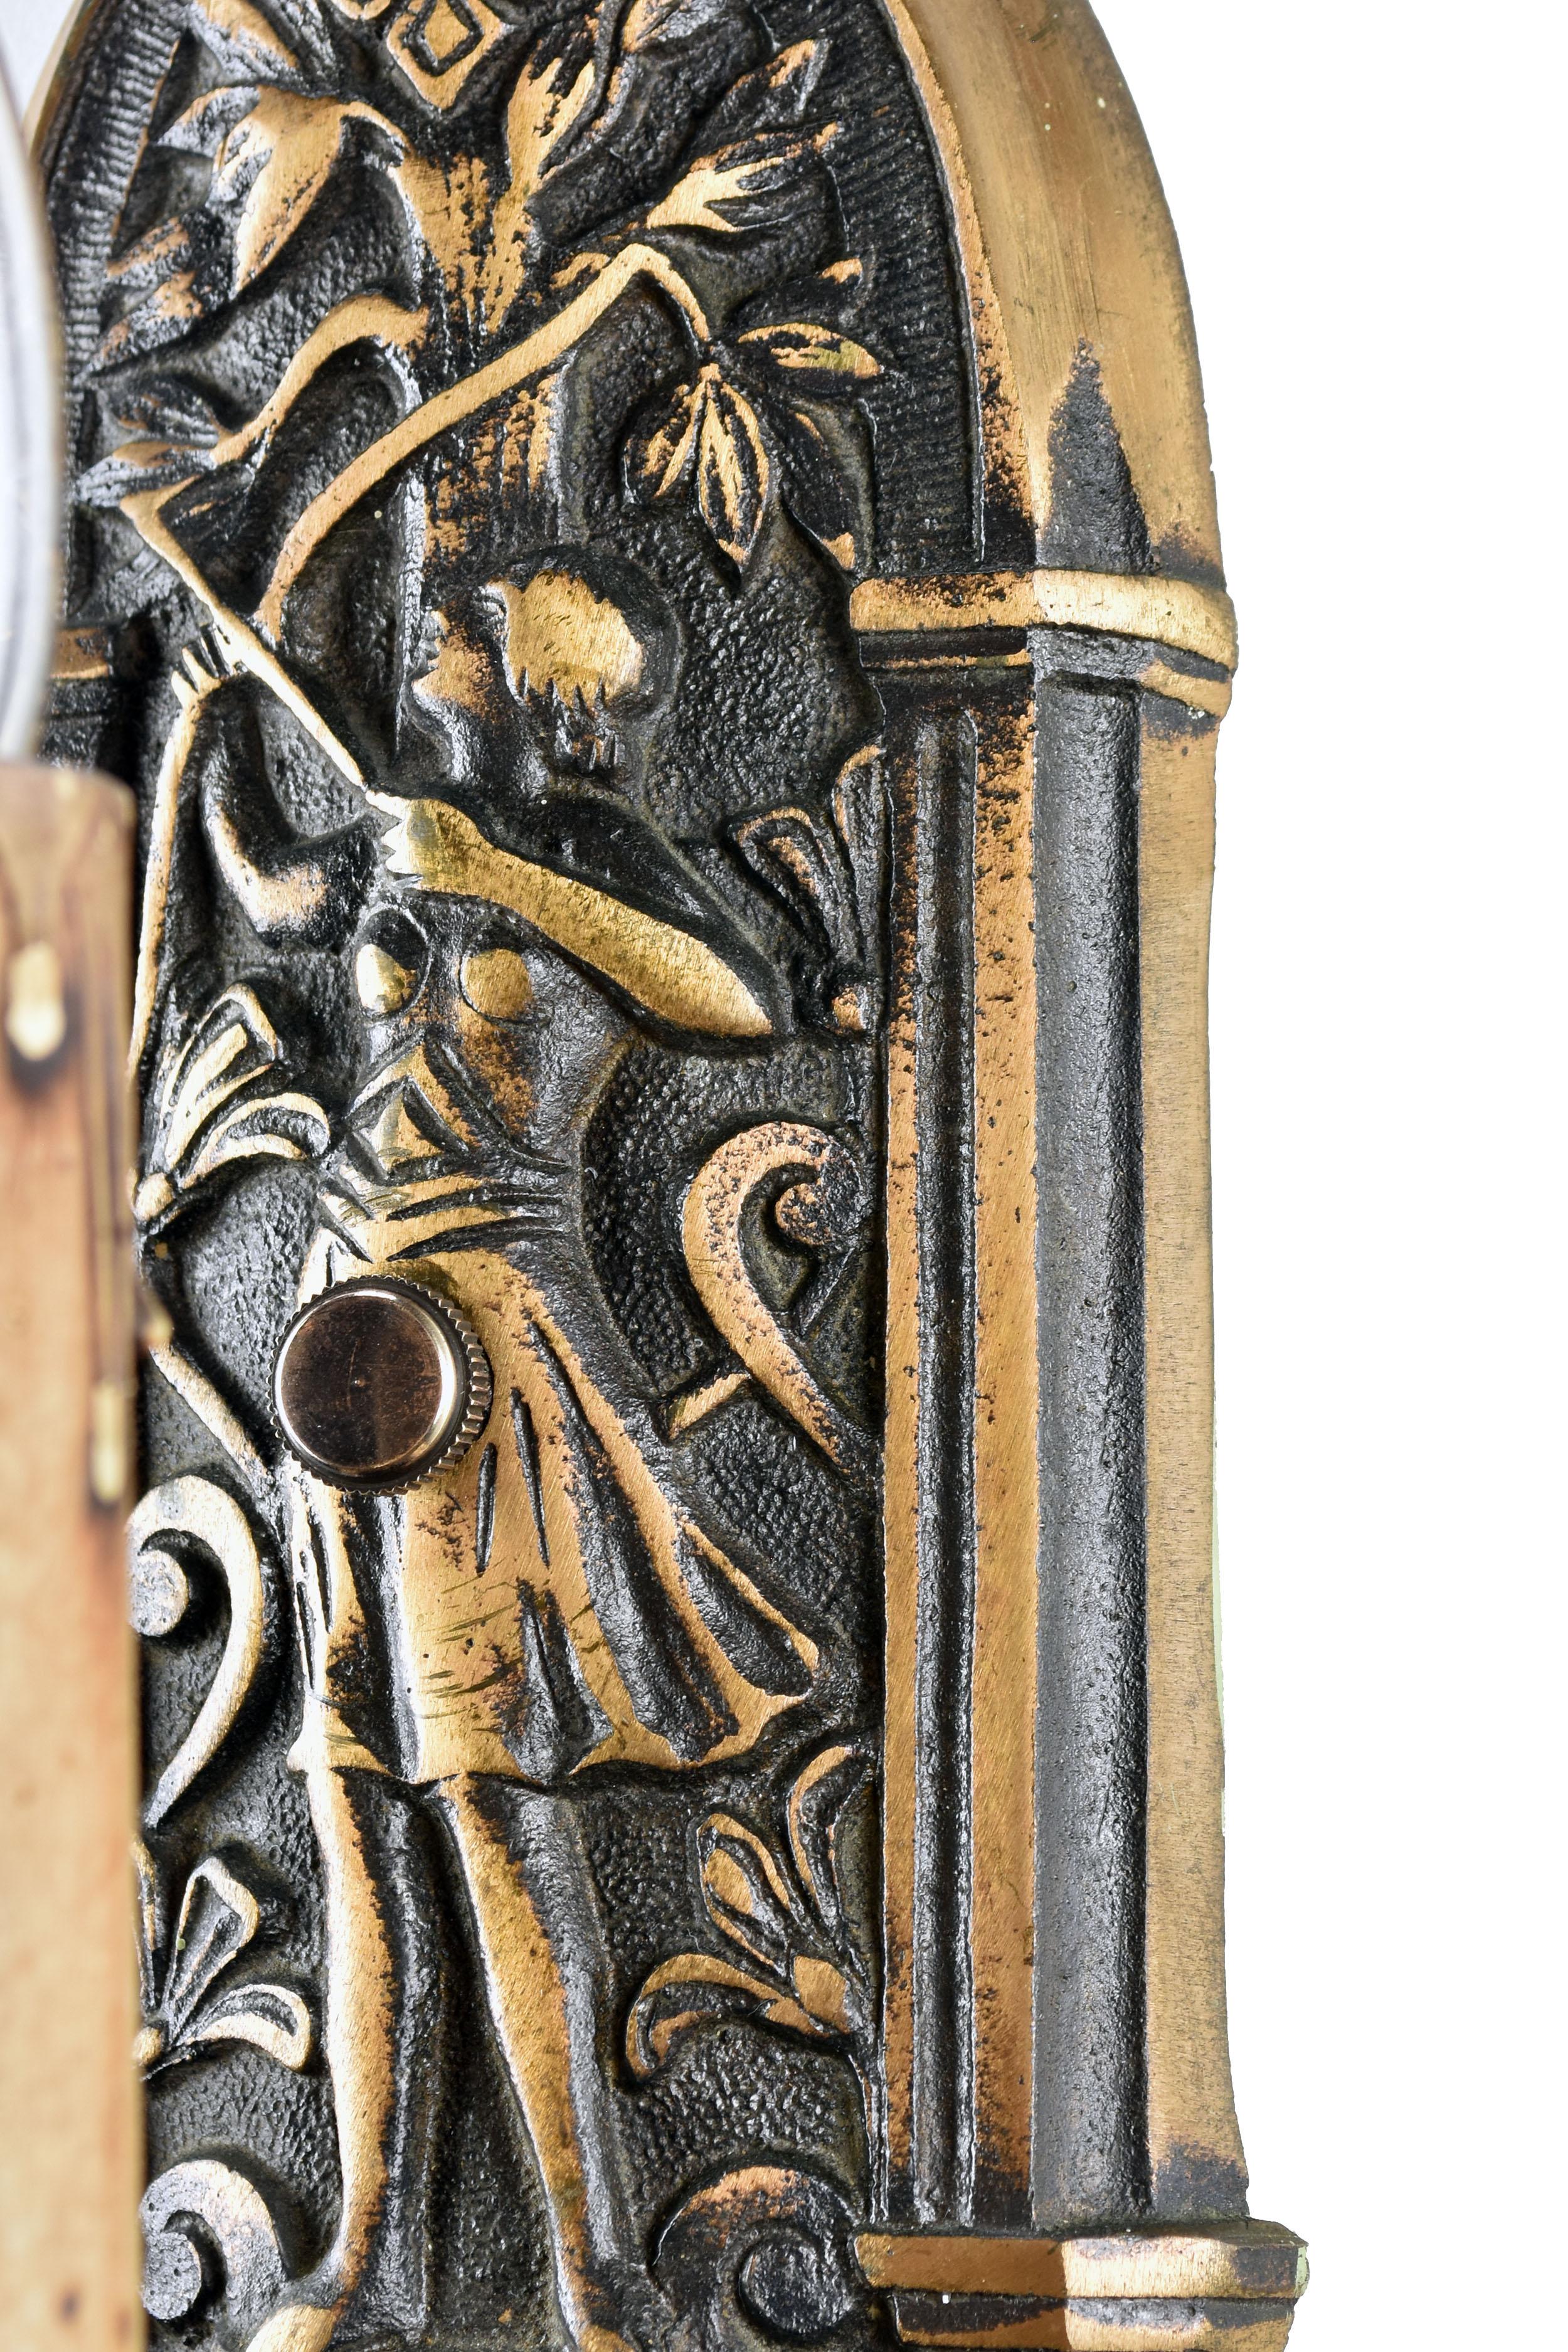 48426 single candle bronze archer sconce close 2.jpg